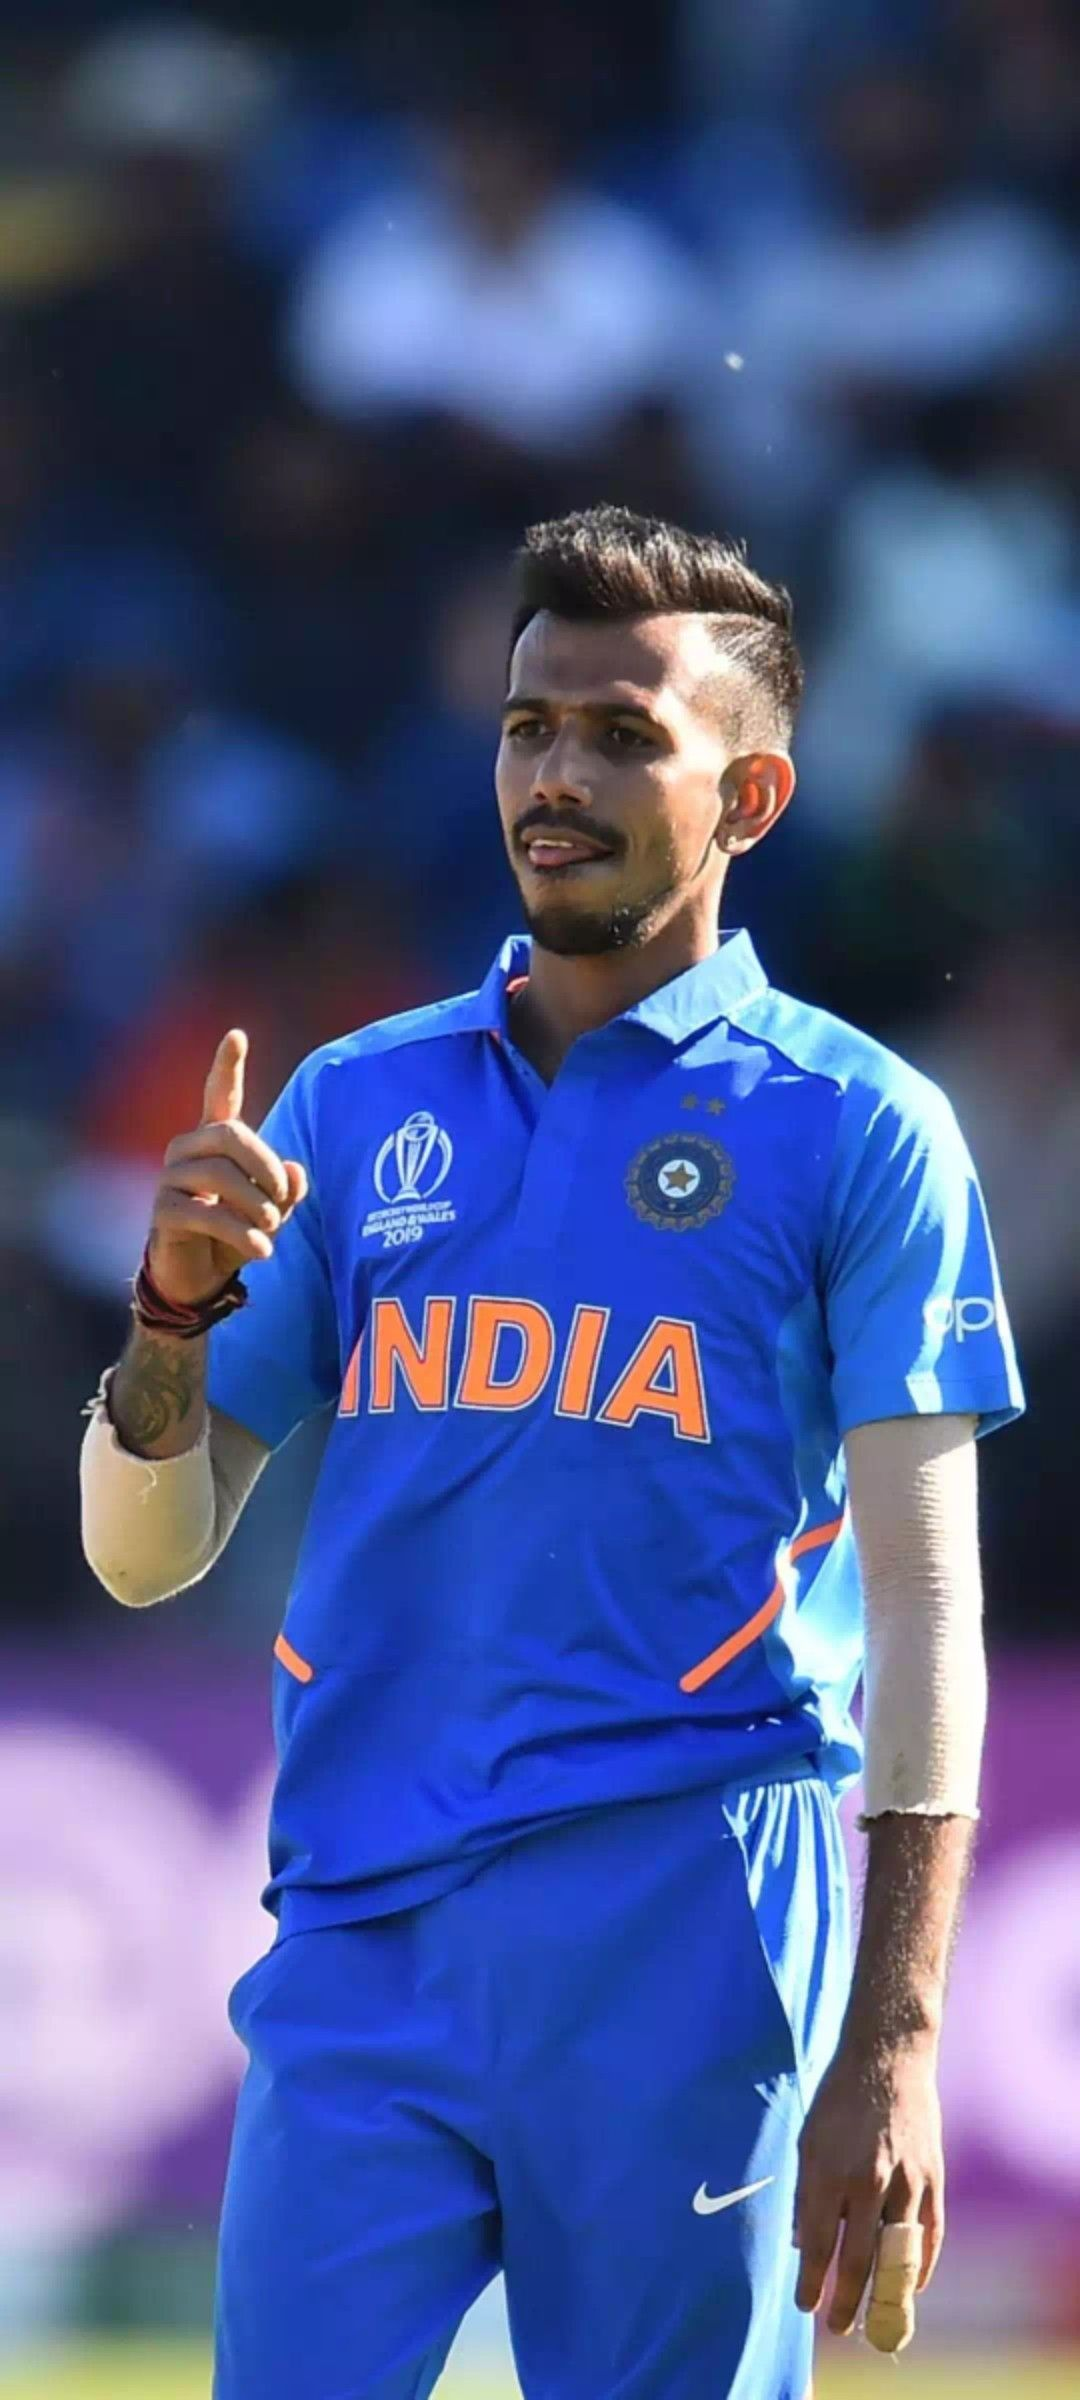 Pin by Suraj Kumar on Cricket Wallpaper | Indian ...